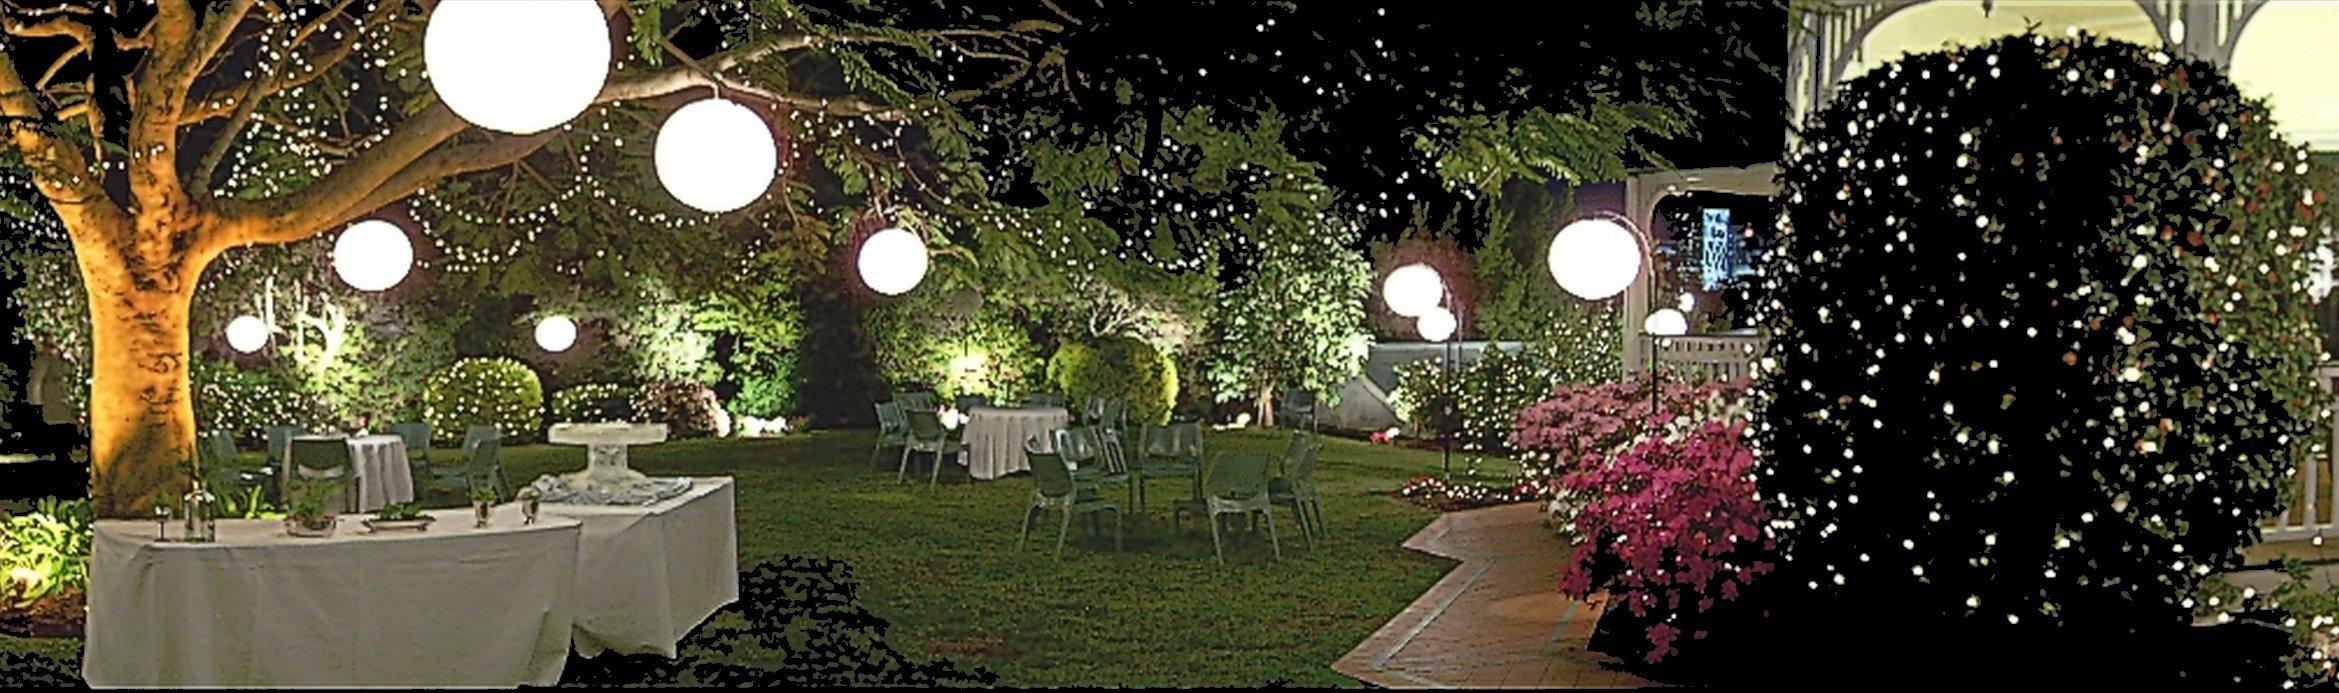 Garden Lights Qld : Lighting hire queensland action packed